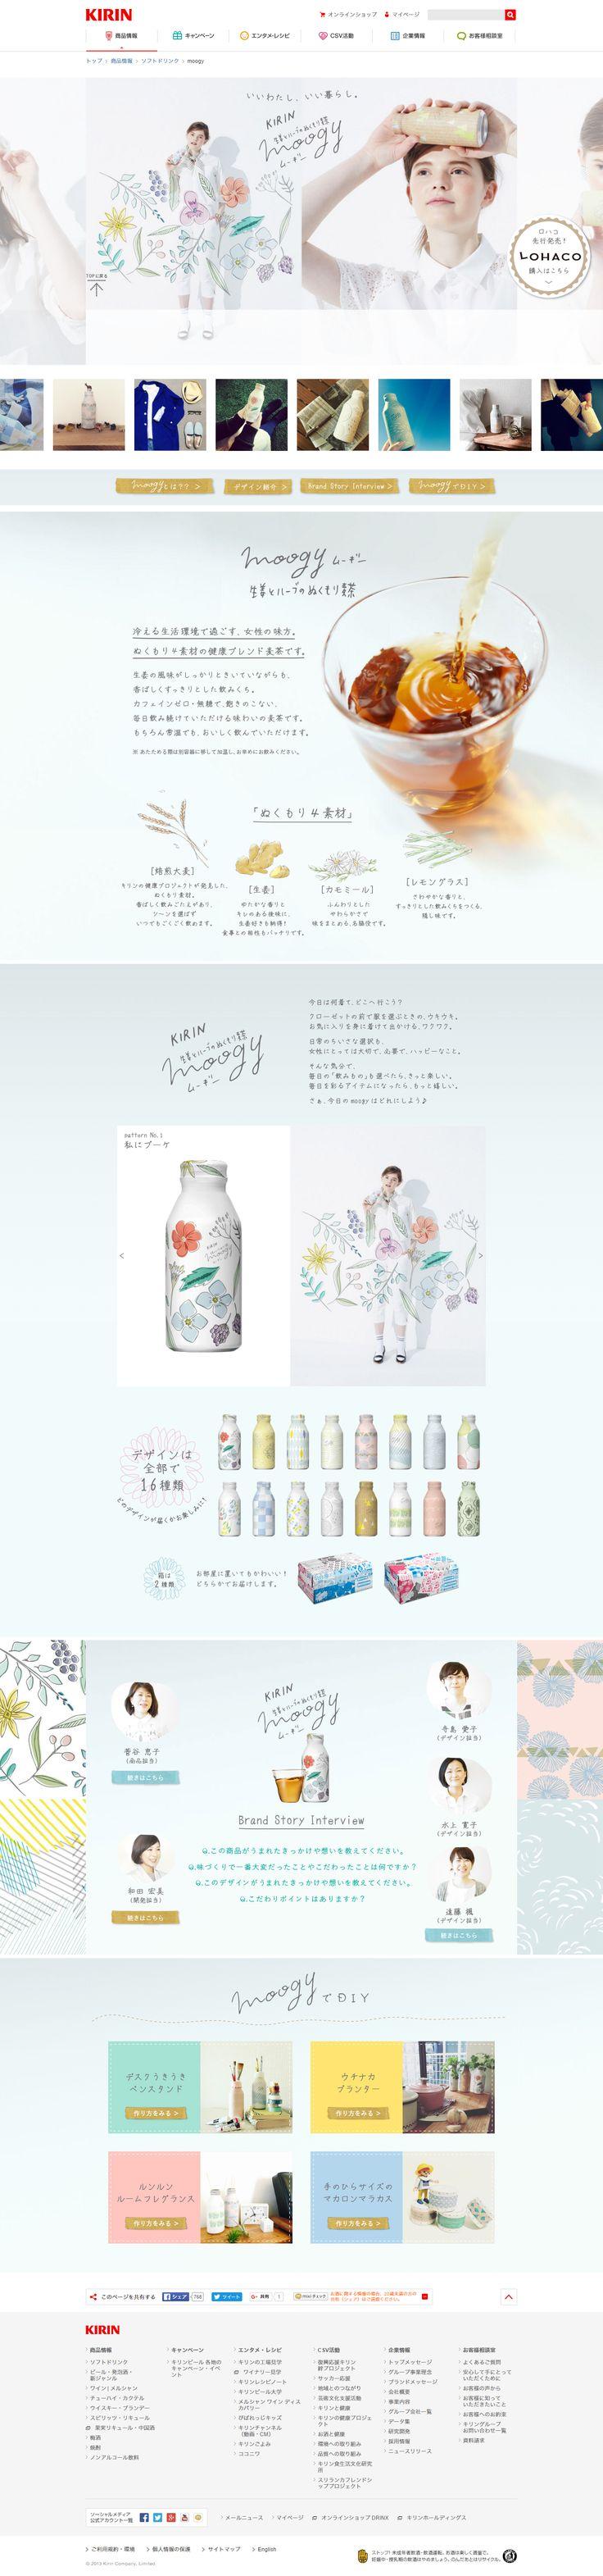 http://www.kirin.co.jp/products/softdrink/moogy/?utm_medium=site